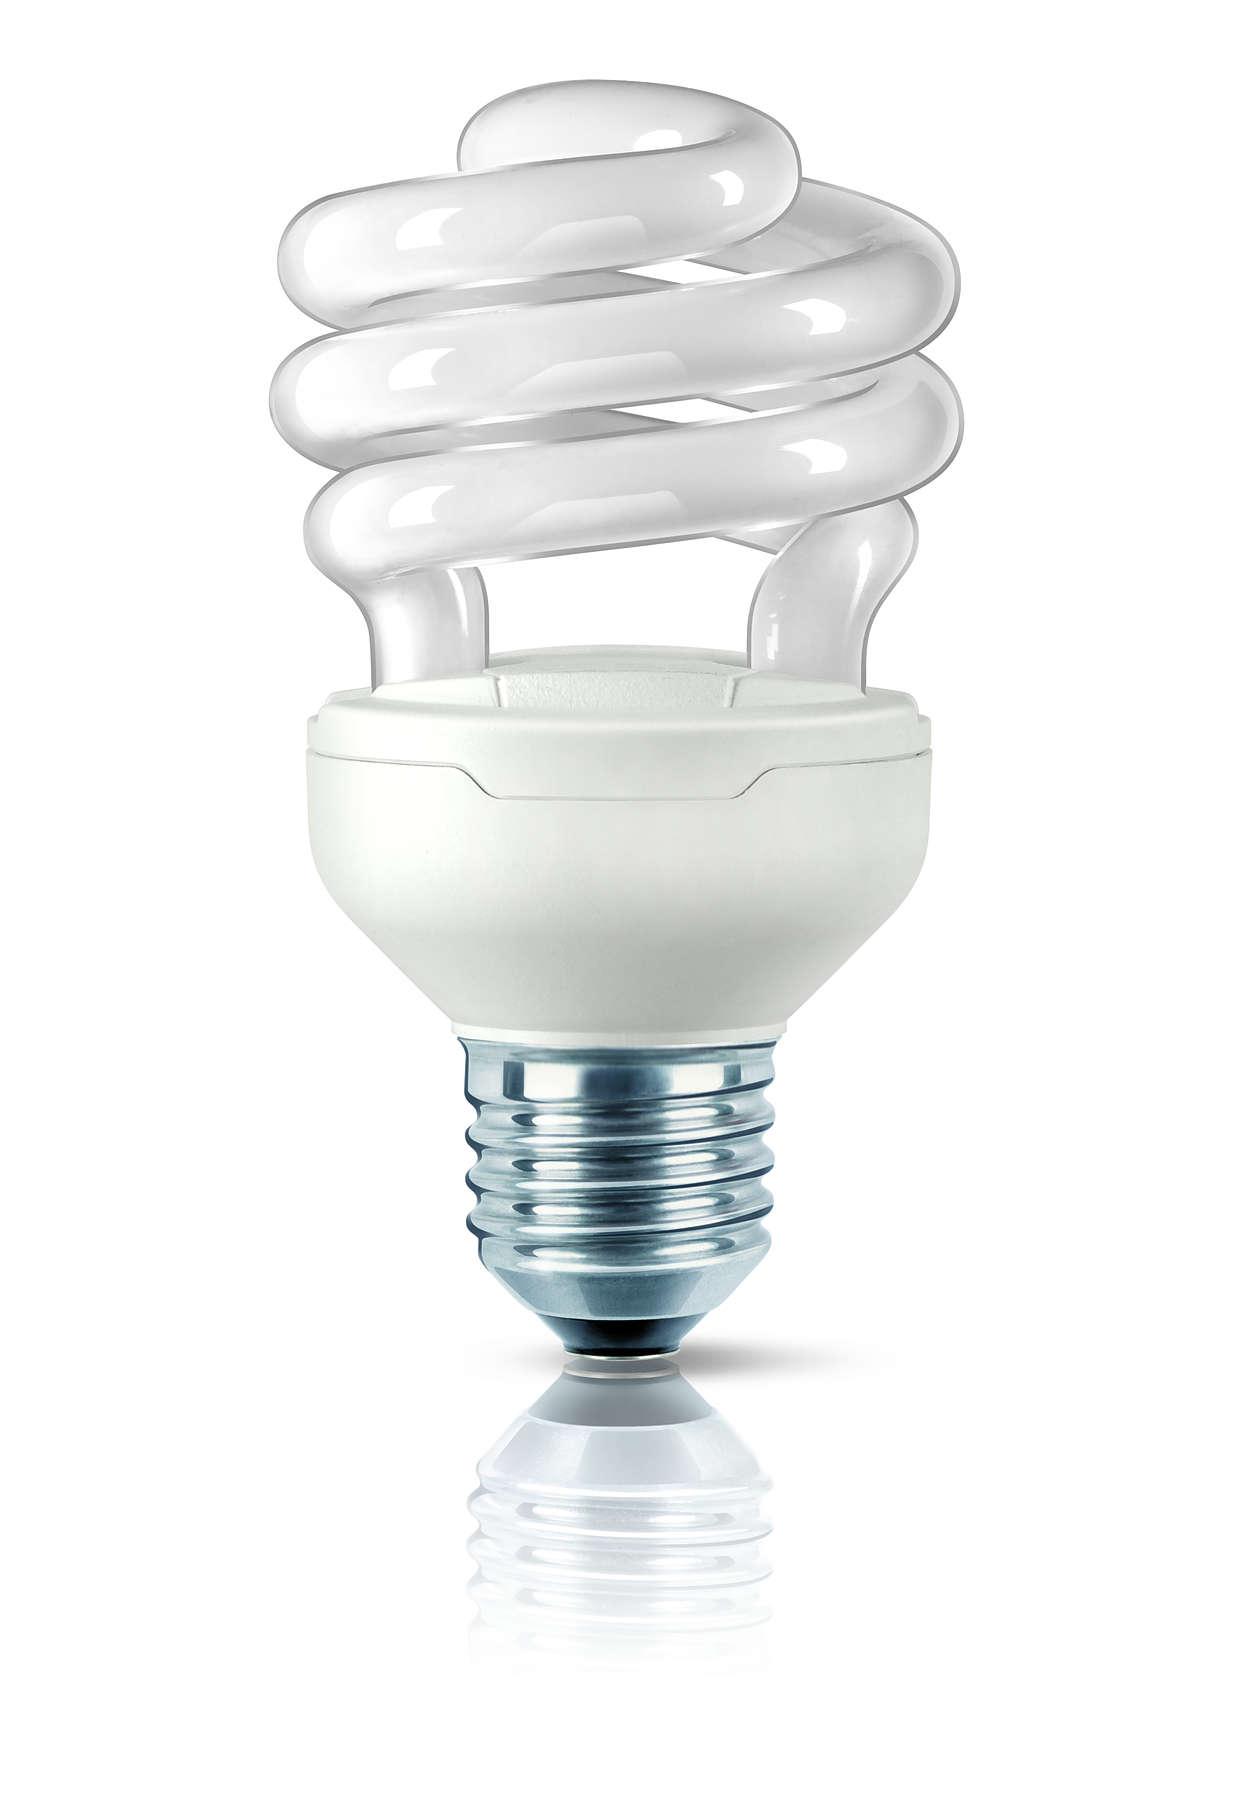 Самая компактная энергосберегающая лампа